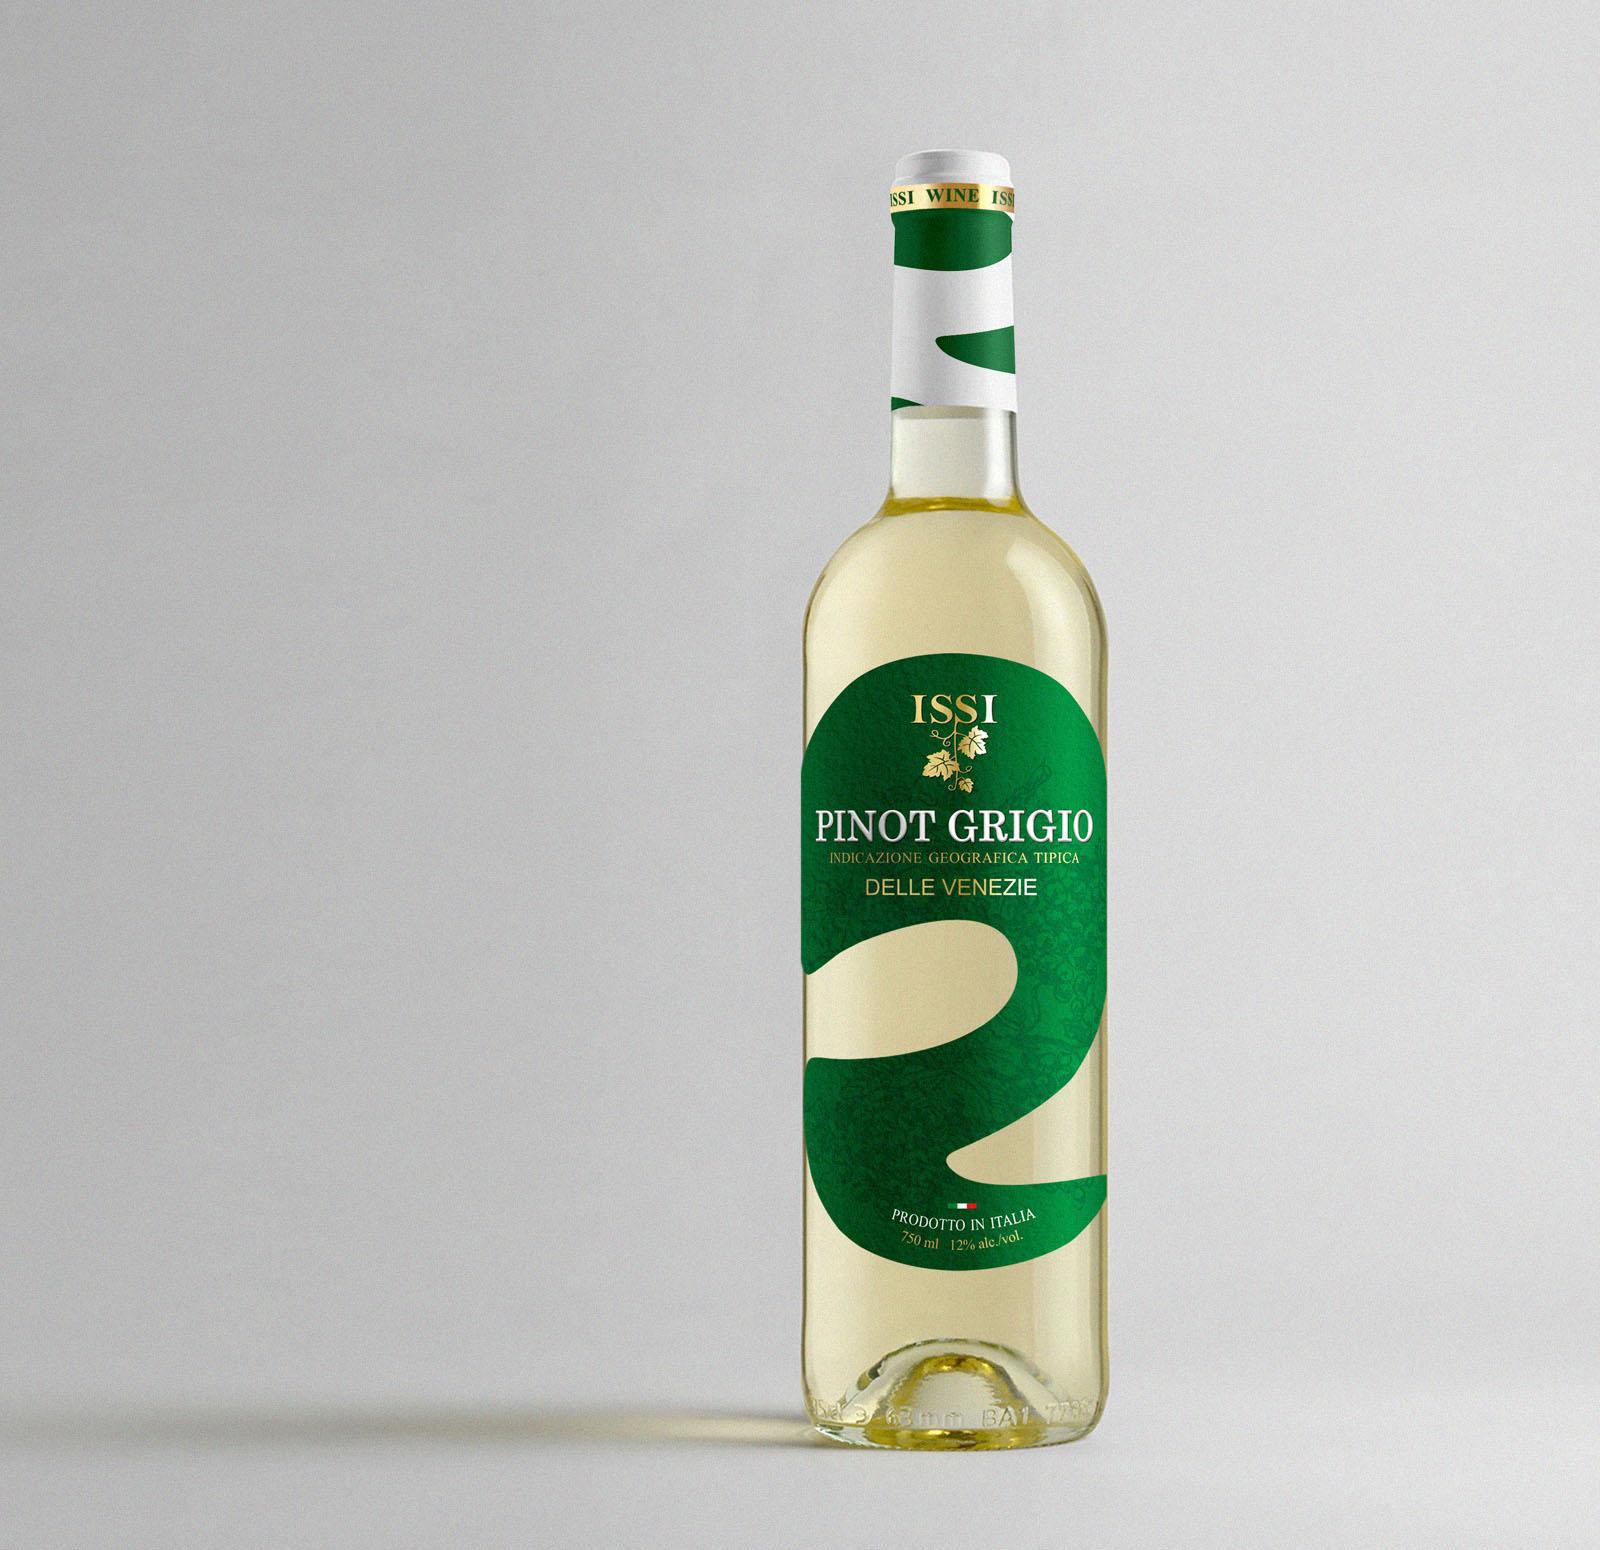 Pinot Grigio Коробки и этикетка для вина. Дизайн на заказ. Упаковка.